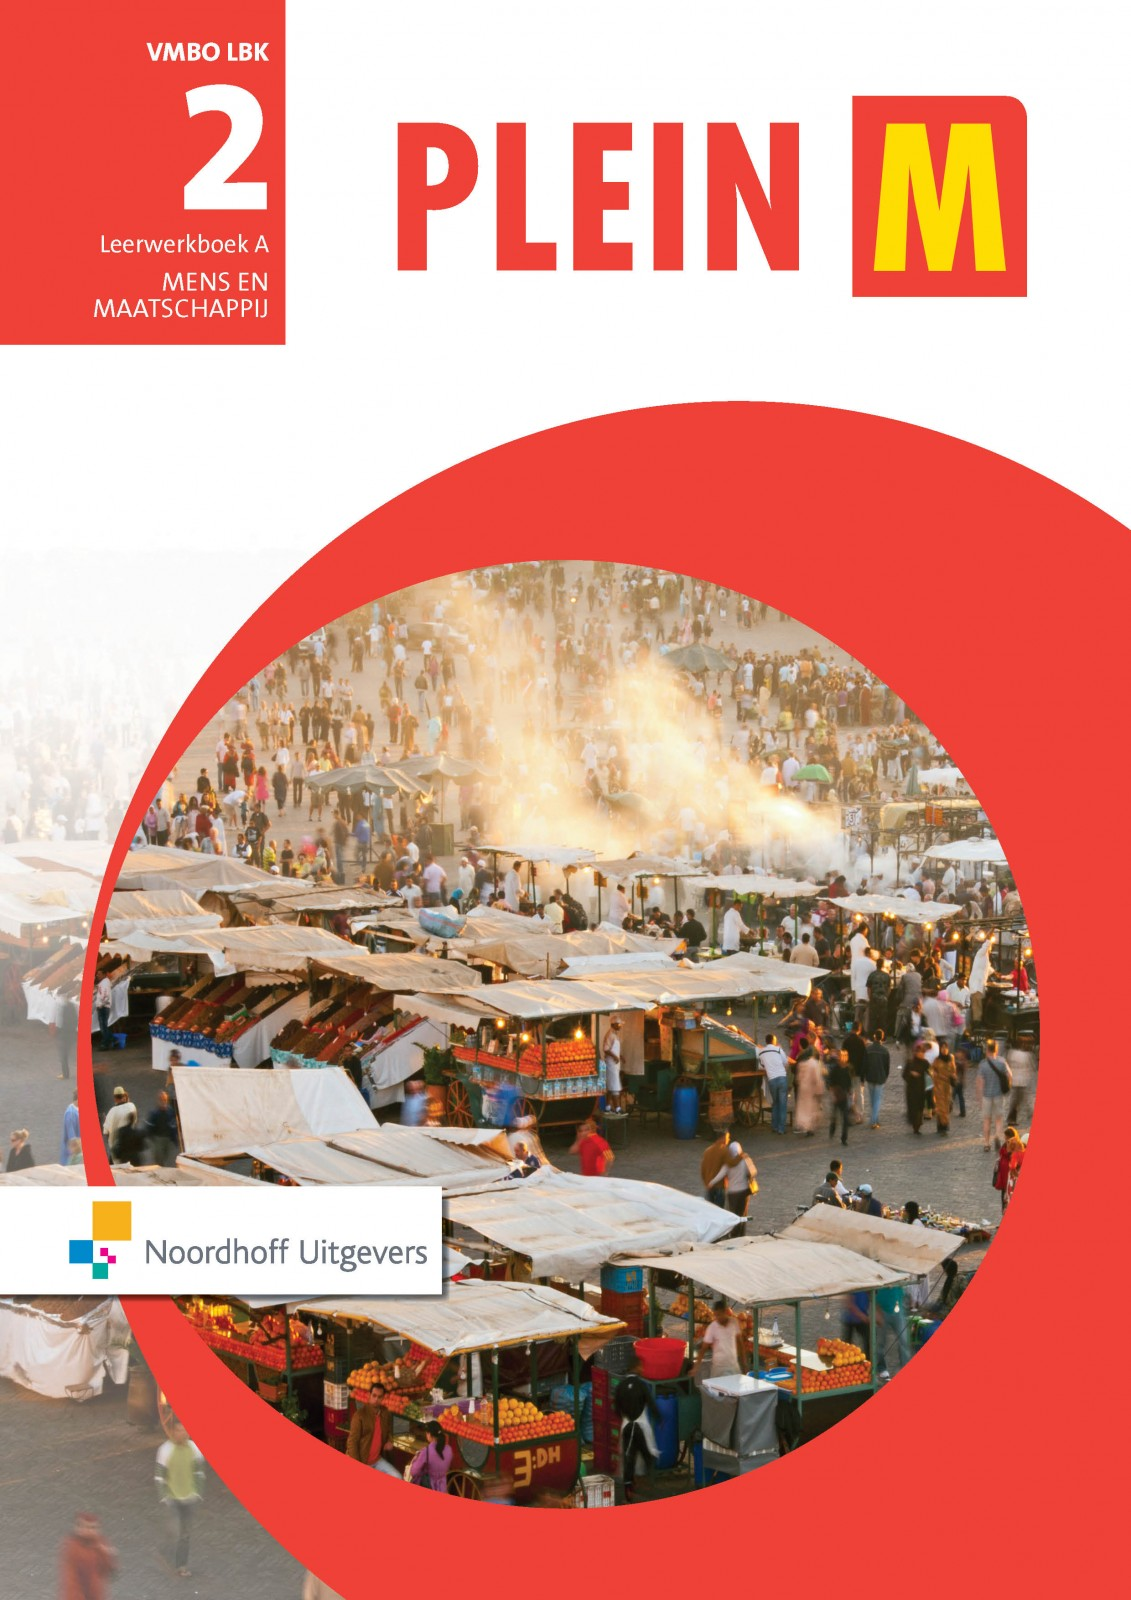 Plein M Cover 2 LBK leerwerkboek A 300 dpi rgb